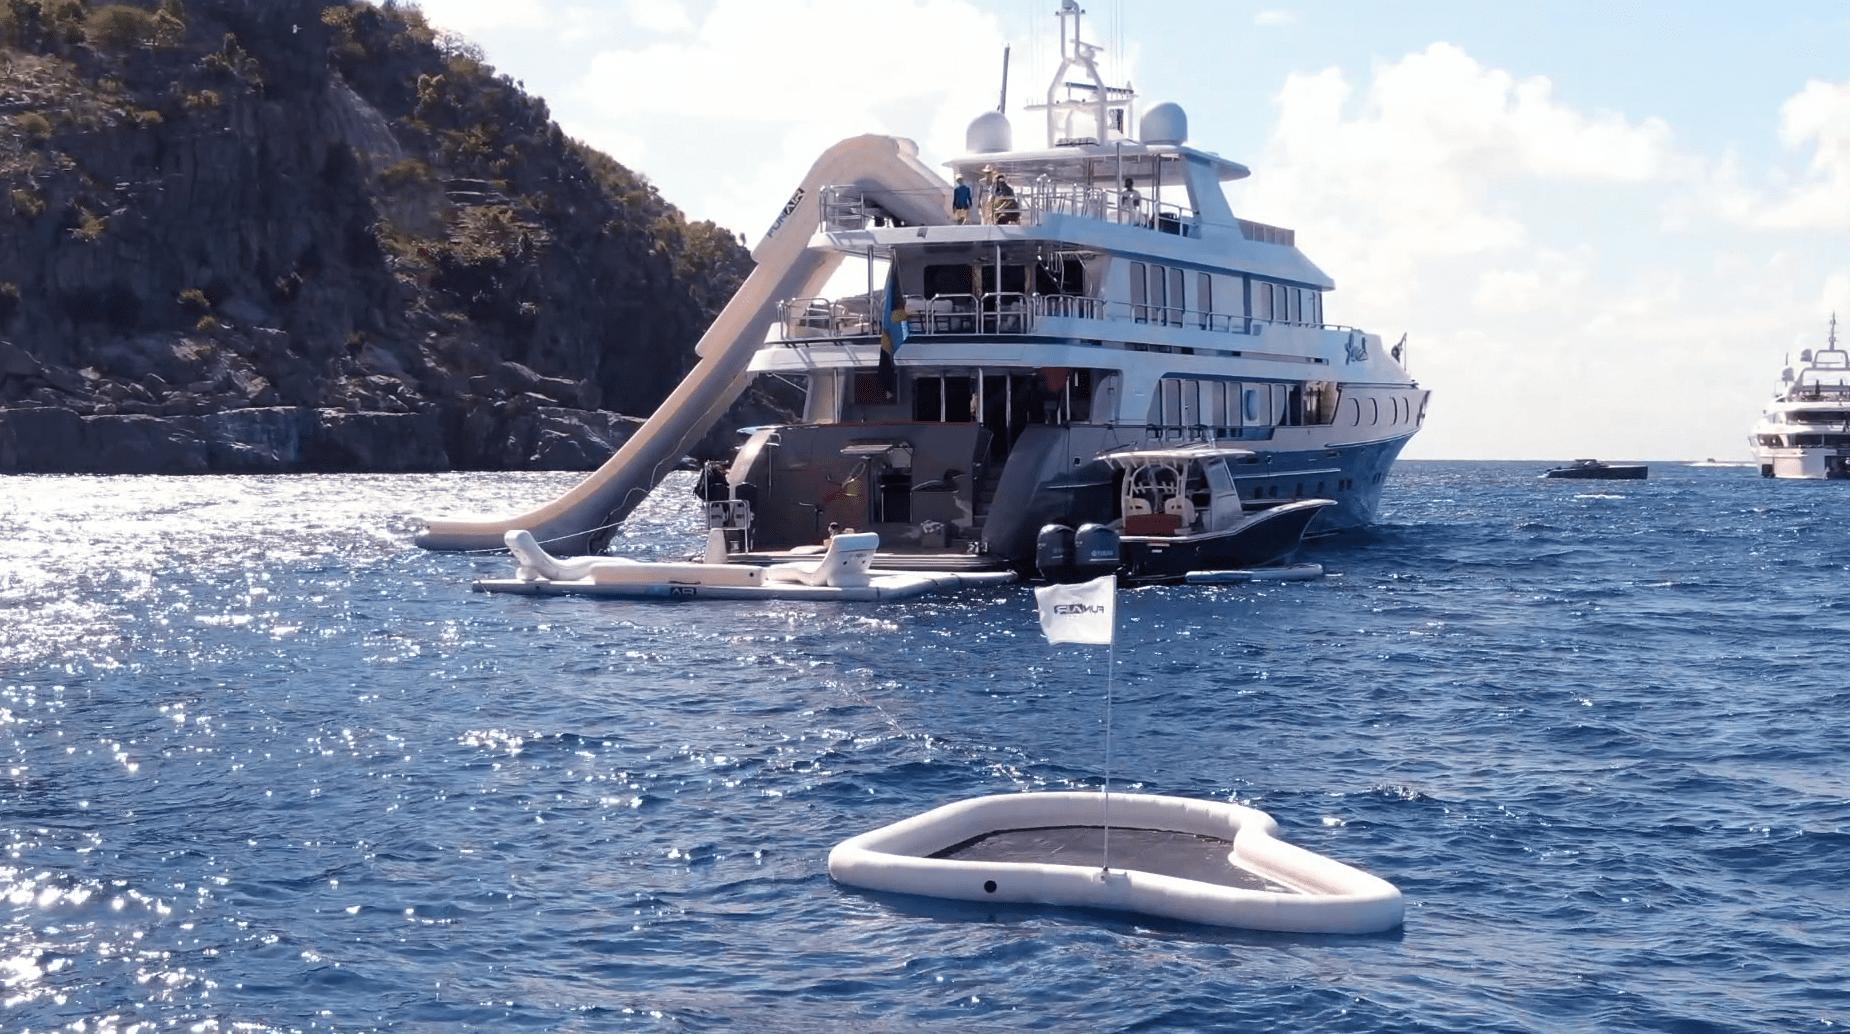 FunAir Yacht Golf